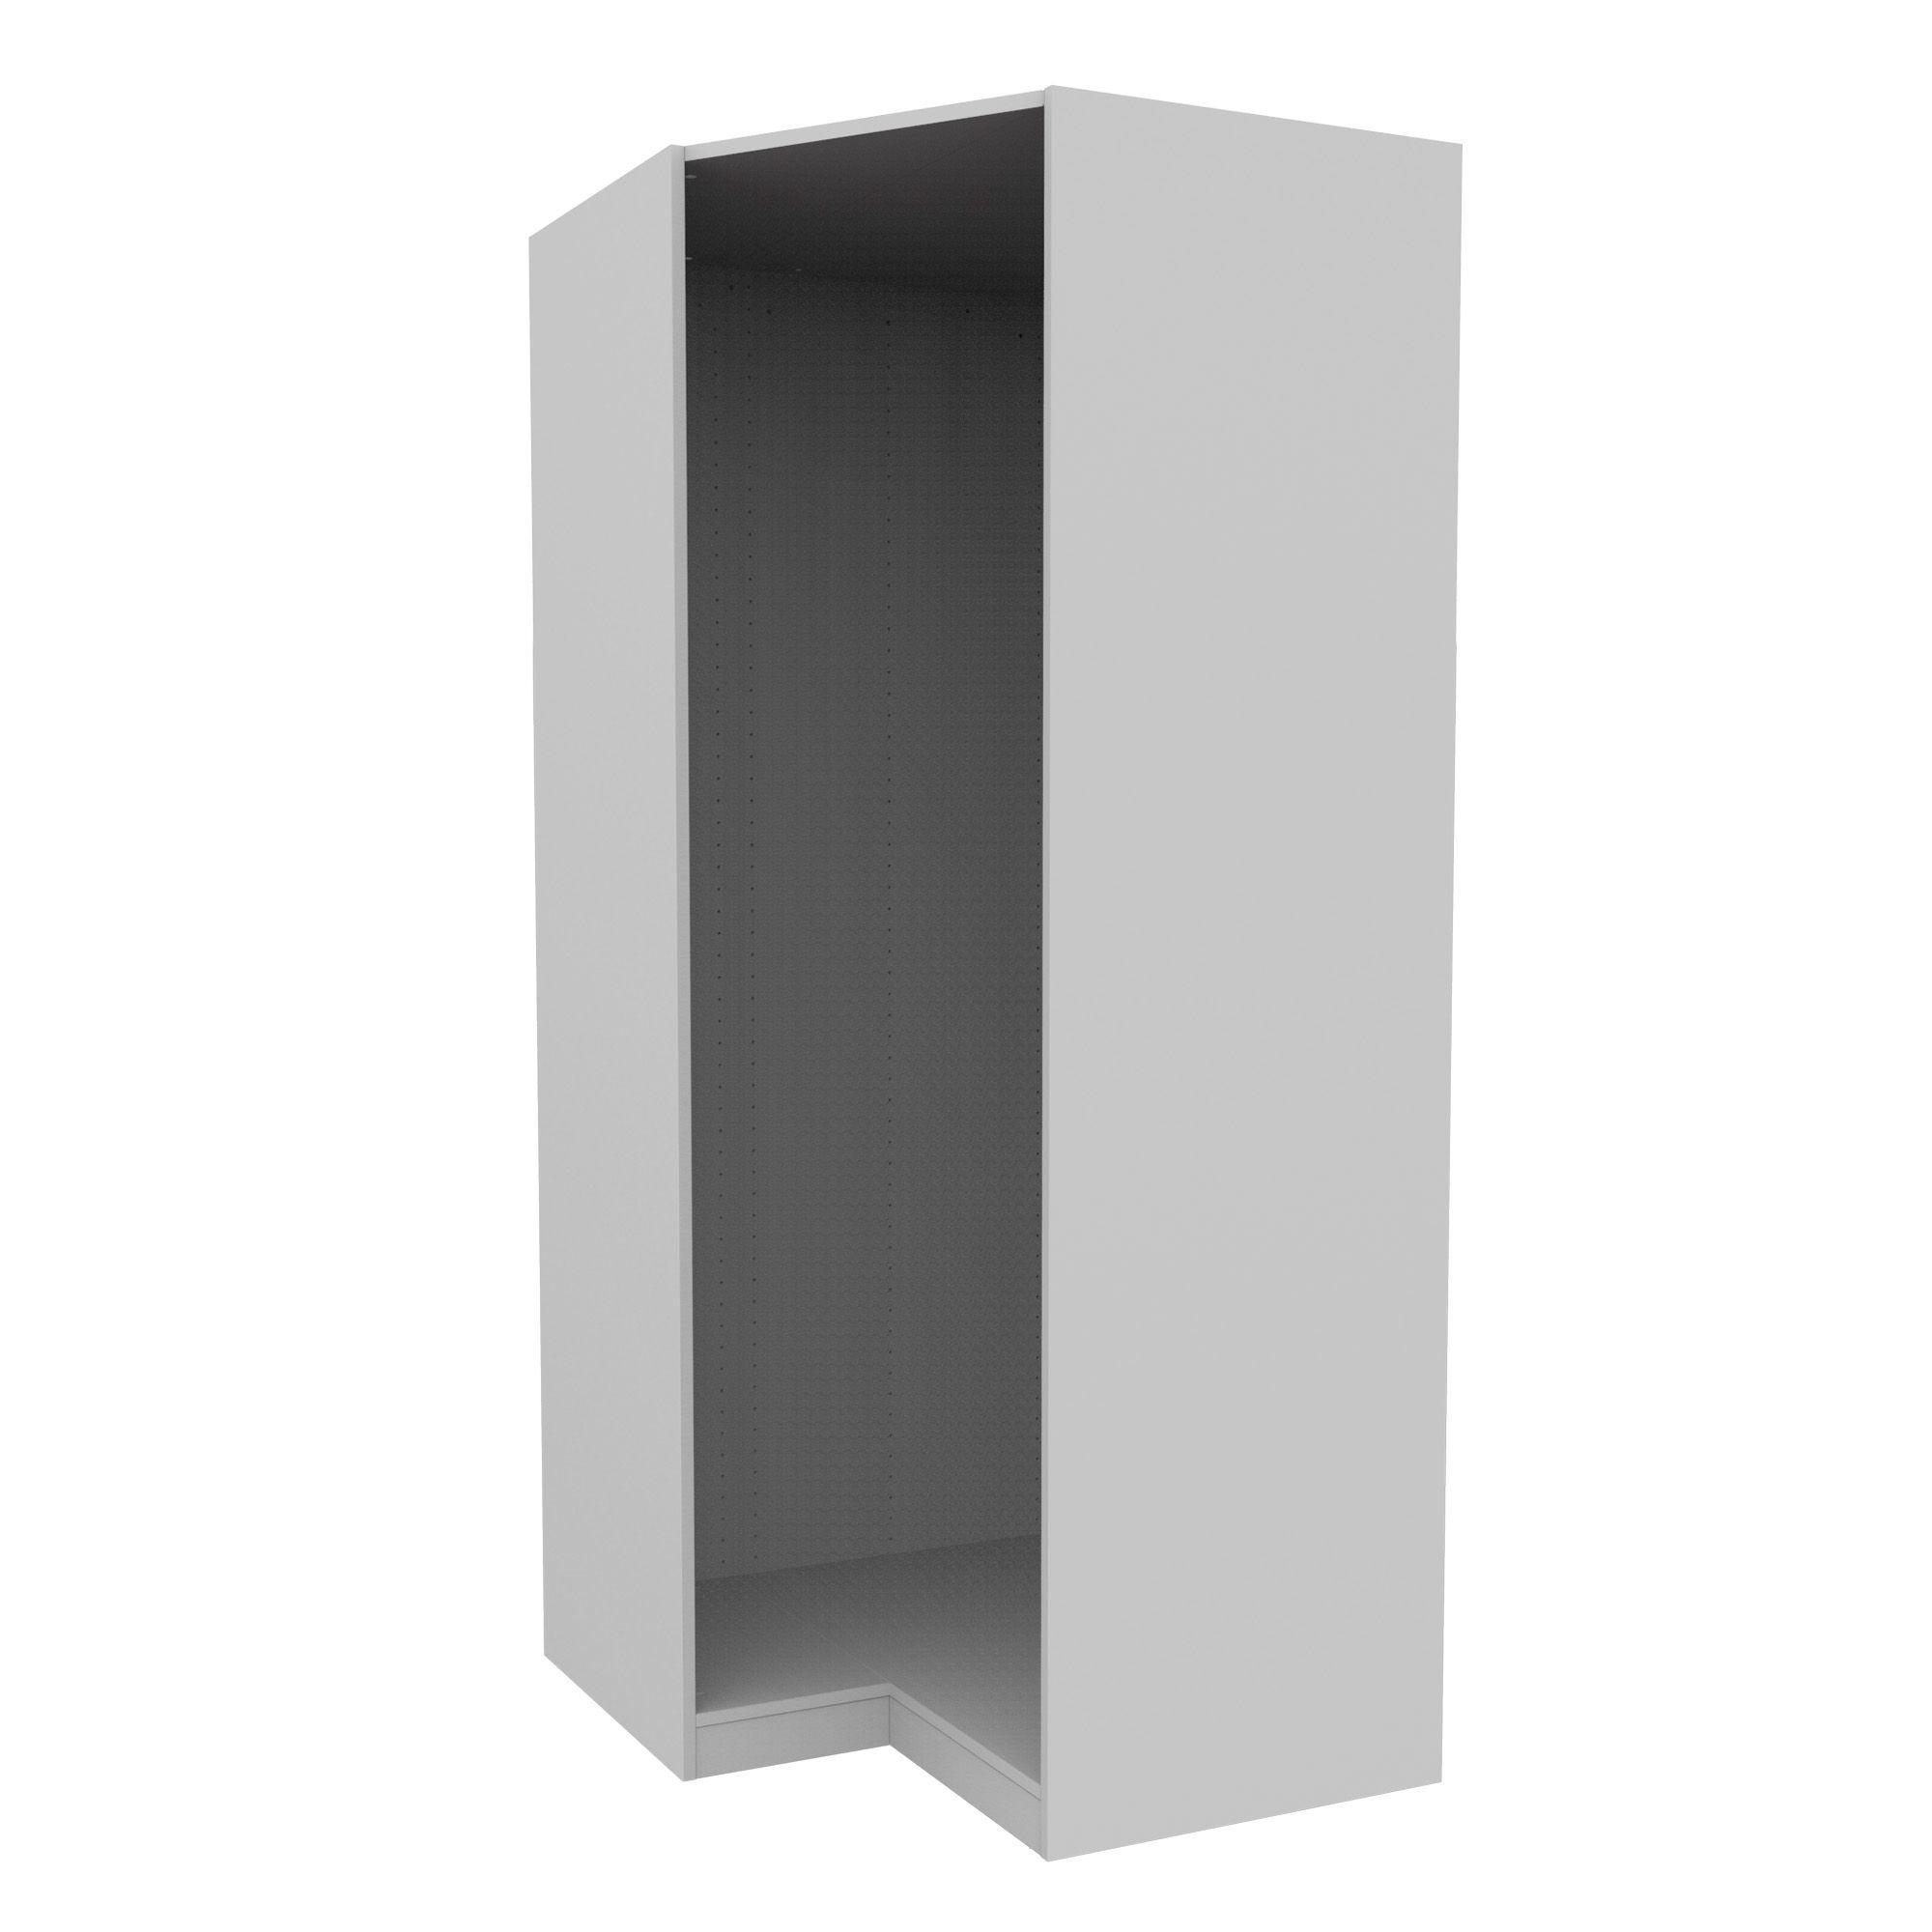 Darwin Modular White Corner Cabinet (h)2004mm (w)998mm (d)662mm